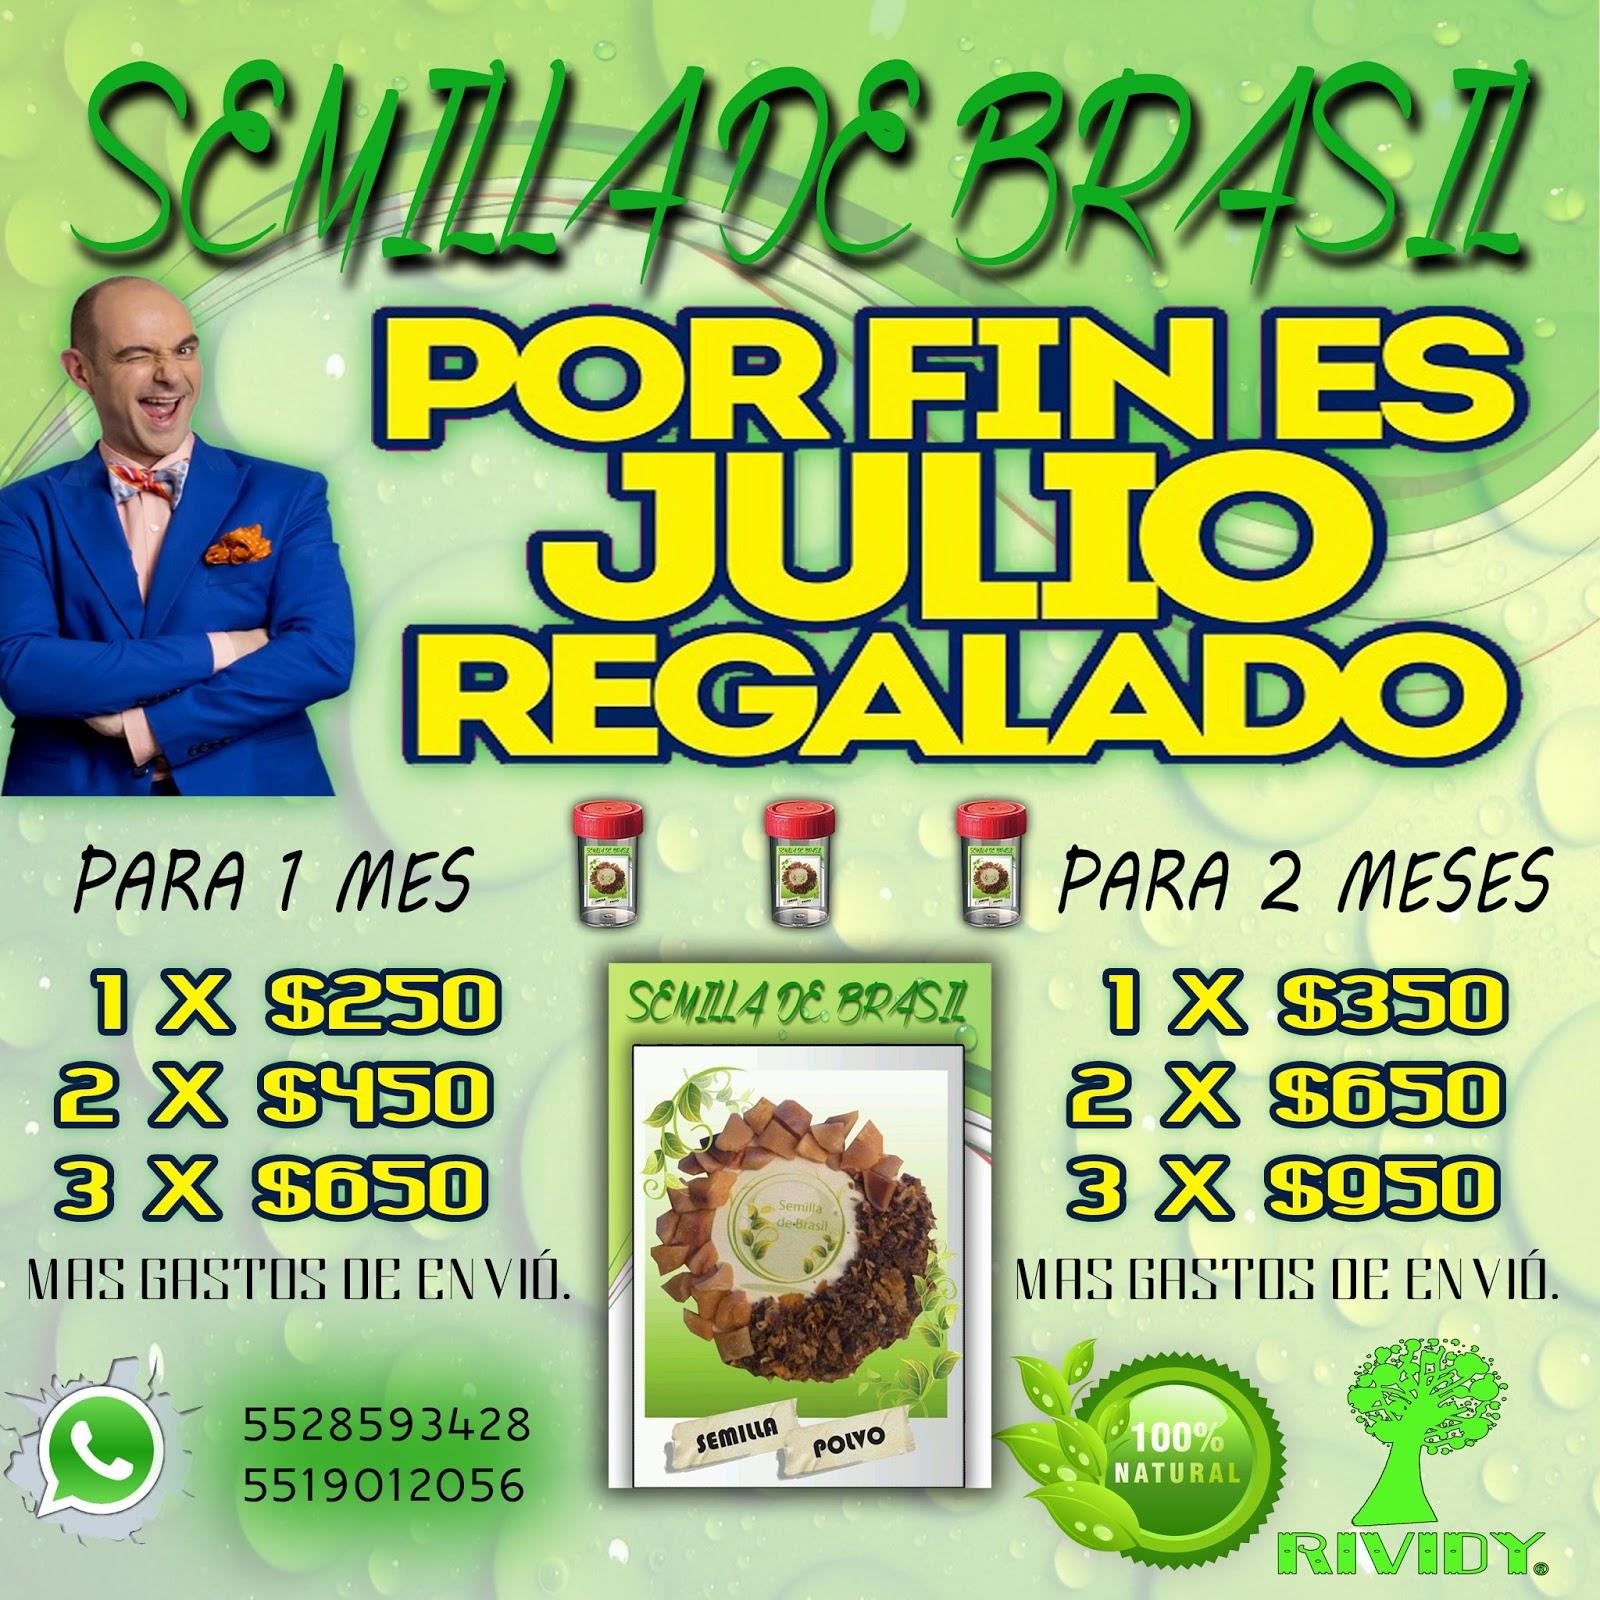 Semilla de brasil rividy julio 2015 Semilla de brasil es toxica